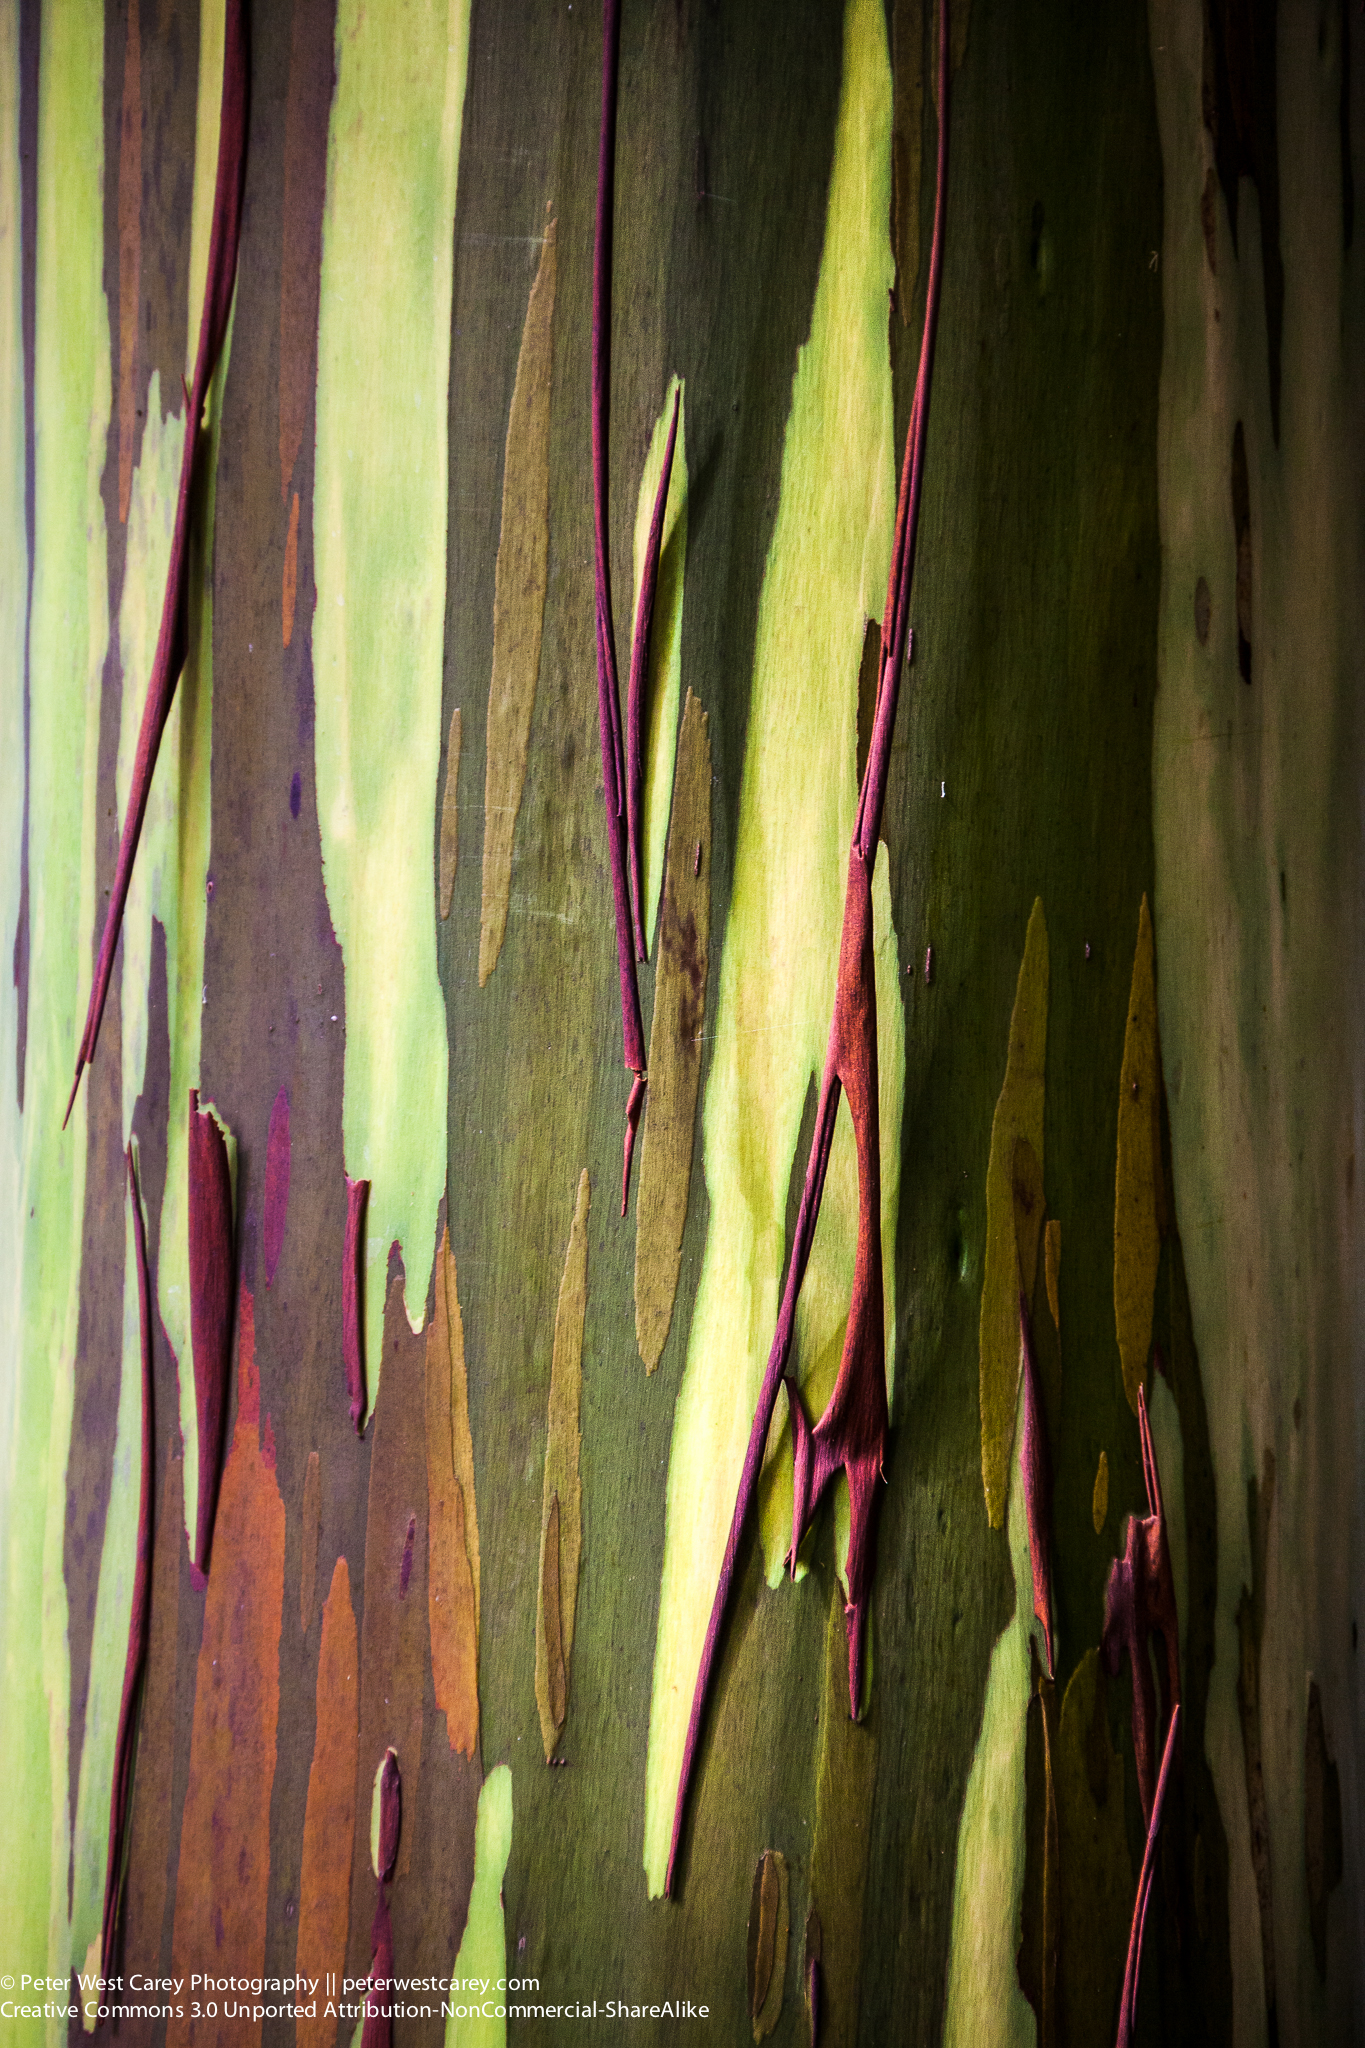 Rainbow Eucalyptus (Eucalyptus deglupta) Tree Bark, Hawaii, USA